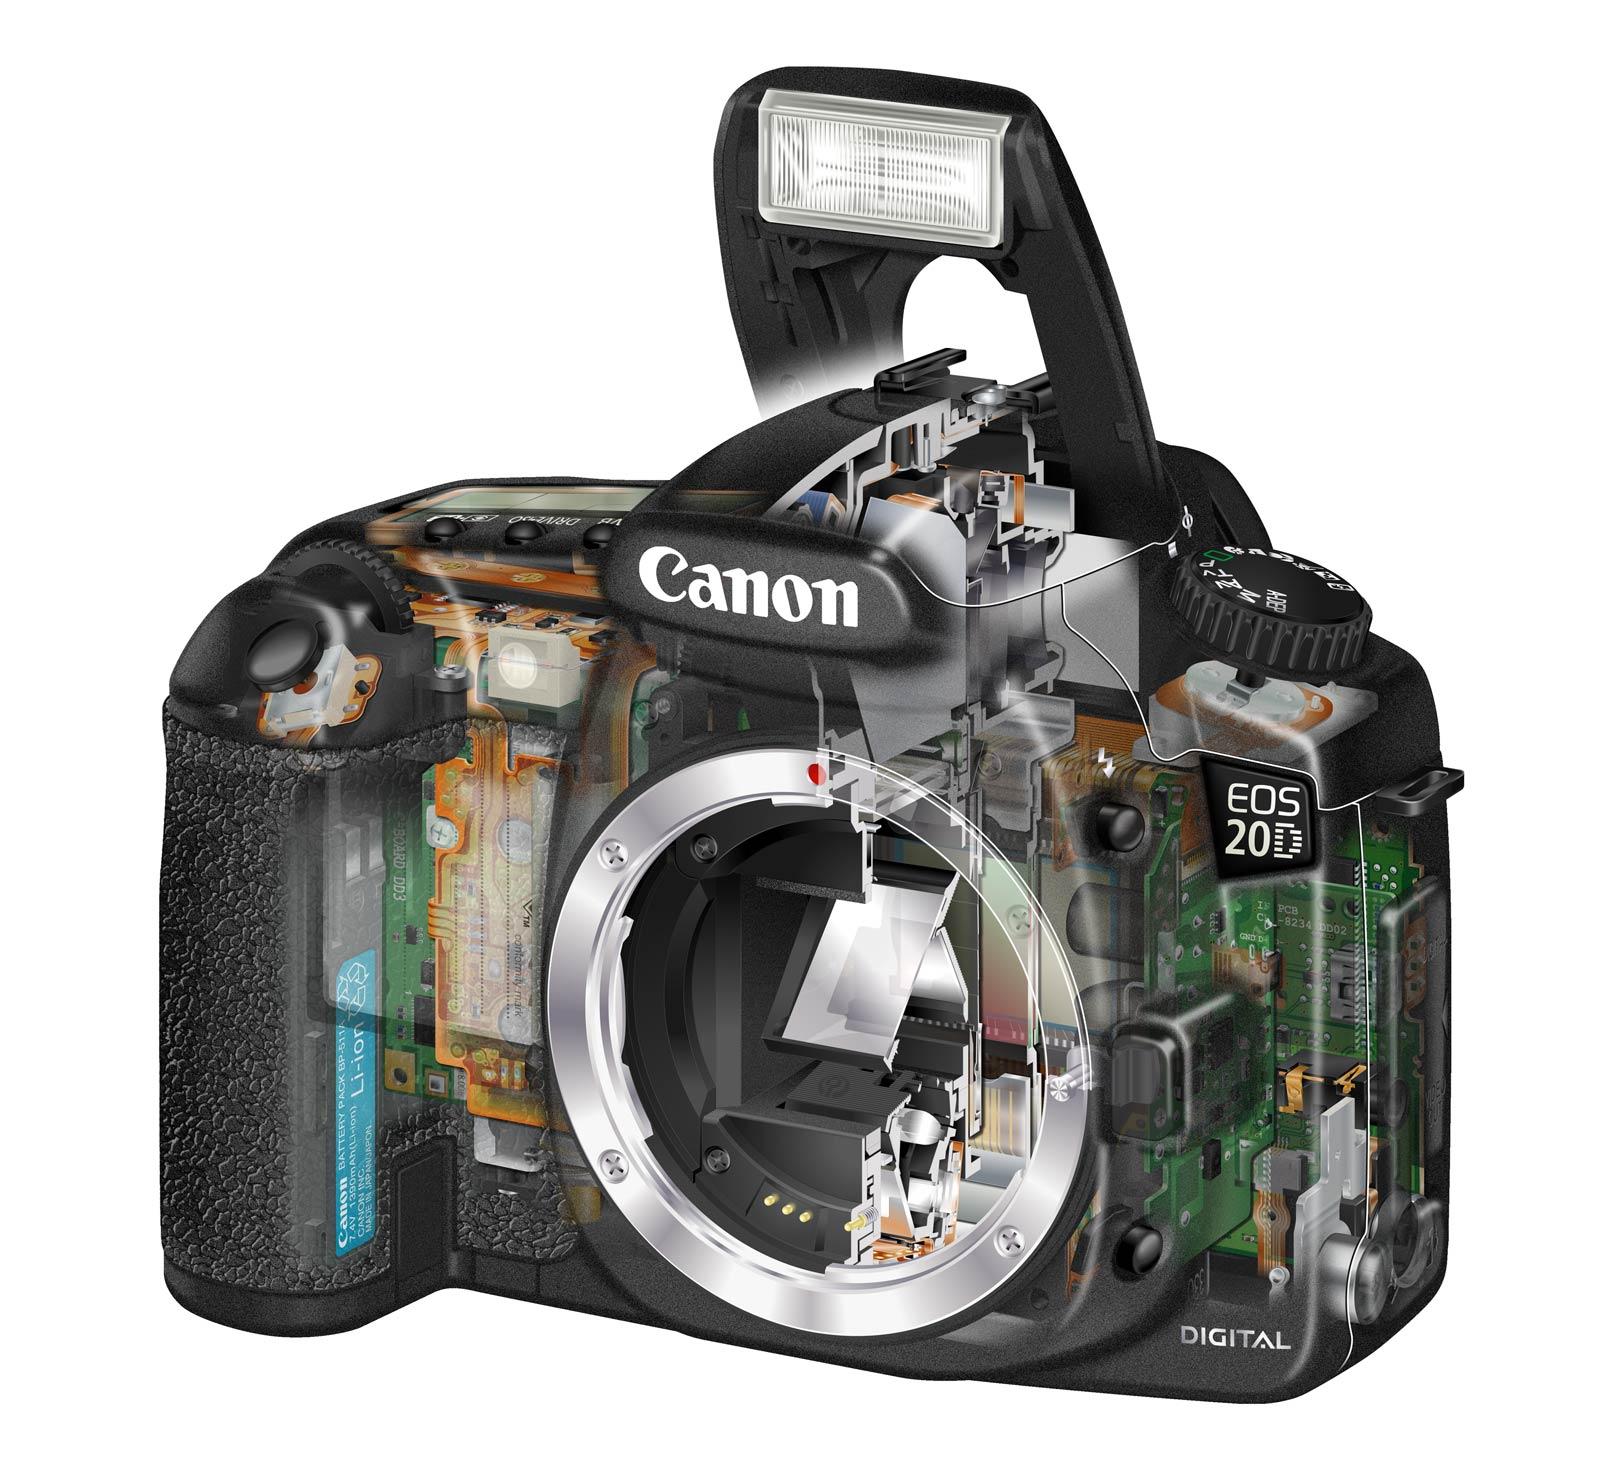 canon eos 20d review digital photography review rh dpreview com Canon 40D Sale Canon 20D Firmware